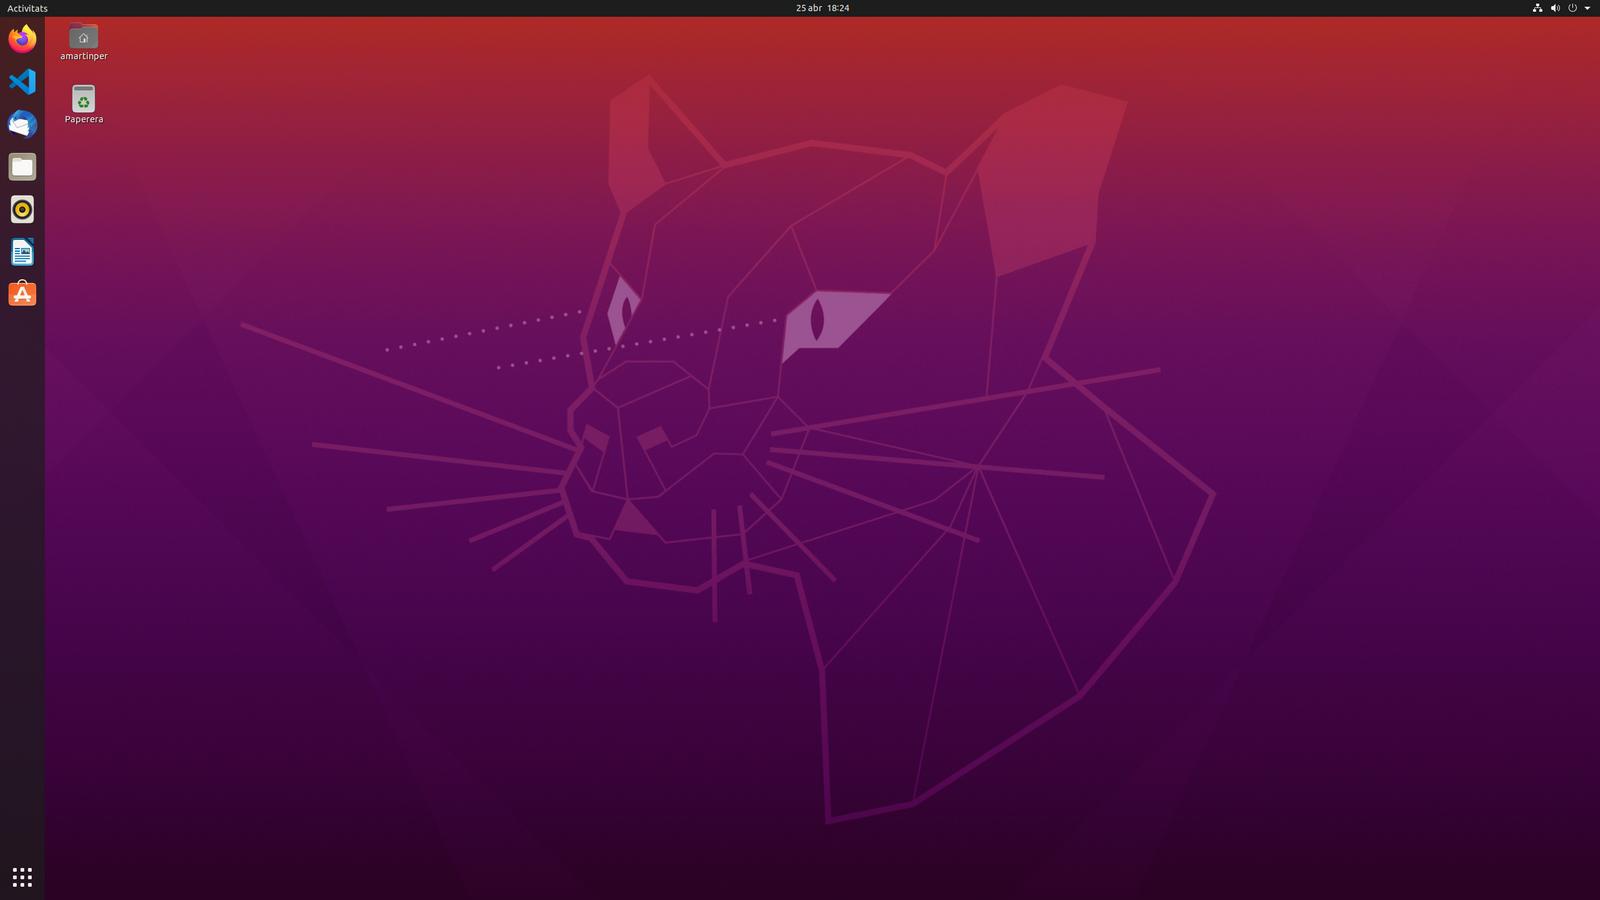 2 Ways to Upgrade Ubuntu 18.04/18.10 To Ubuntu 19.04 (GUI & Terminal)